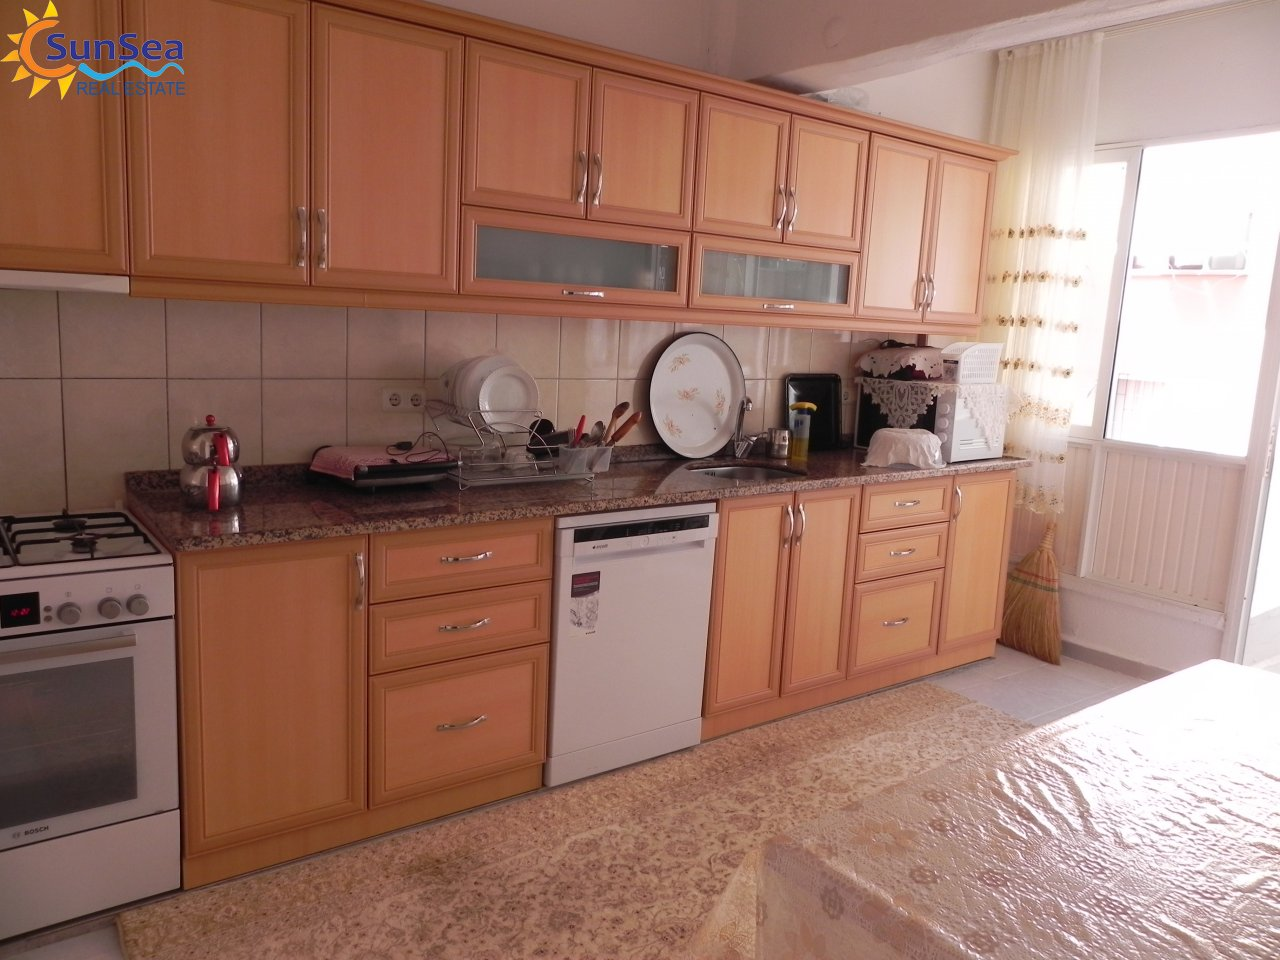 Onur apartment damlataş kitchen